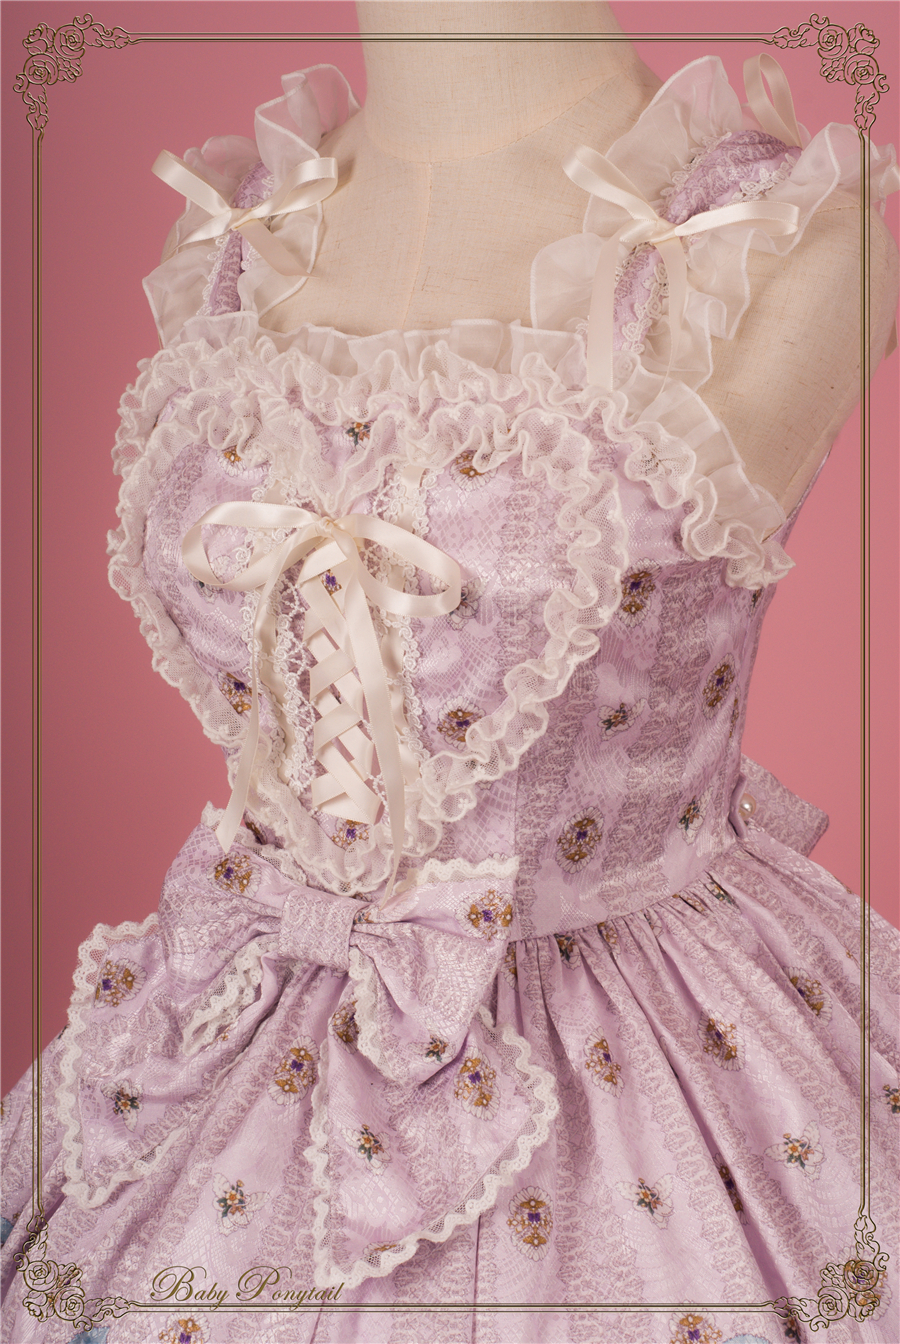 BabyPonytail_Stock Photo_My Favorite Companion_JSK Lavender_4.jpg